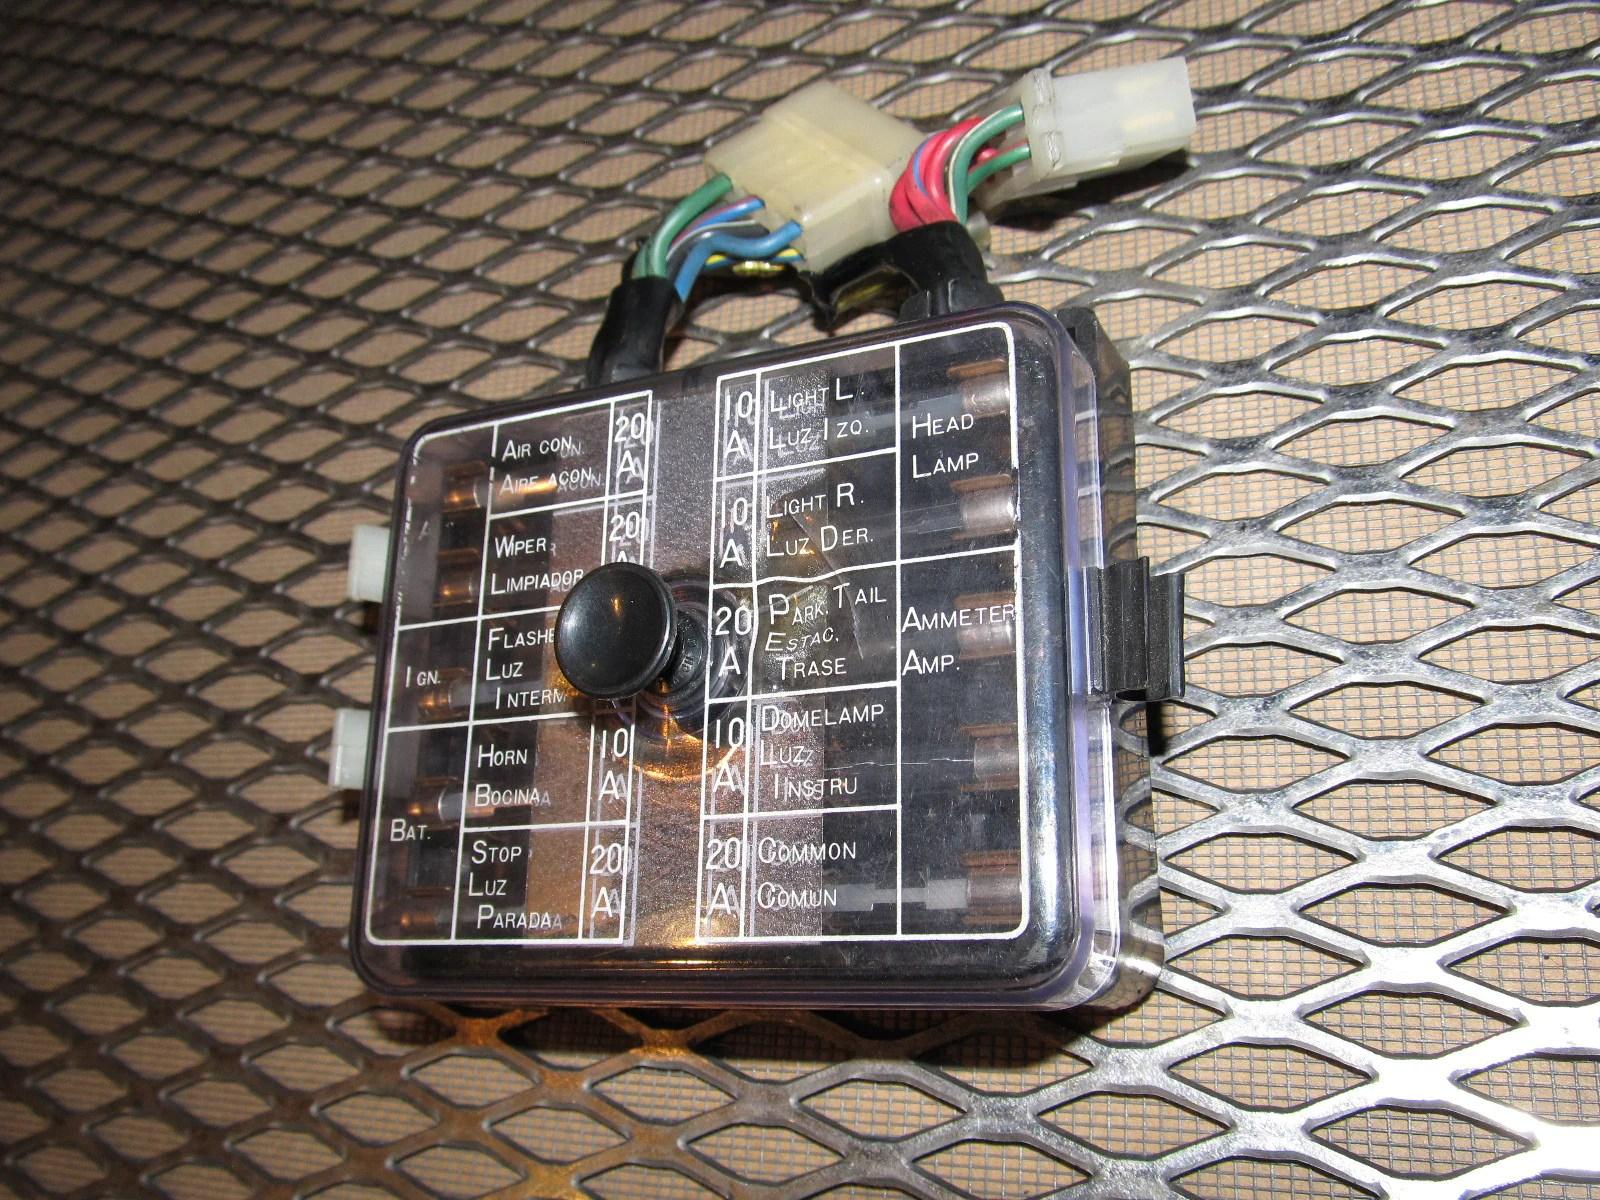 72 73 datsun 240z oem interior fuse box  [ 1600 x 1200 Pixel ]